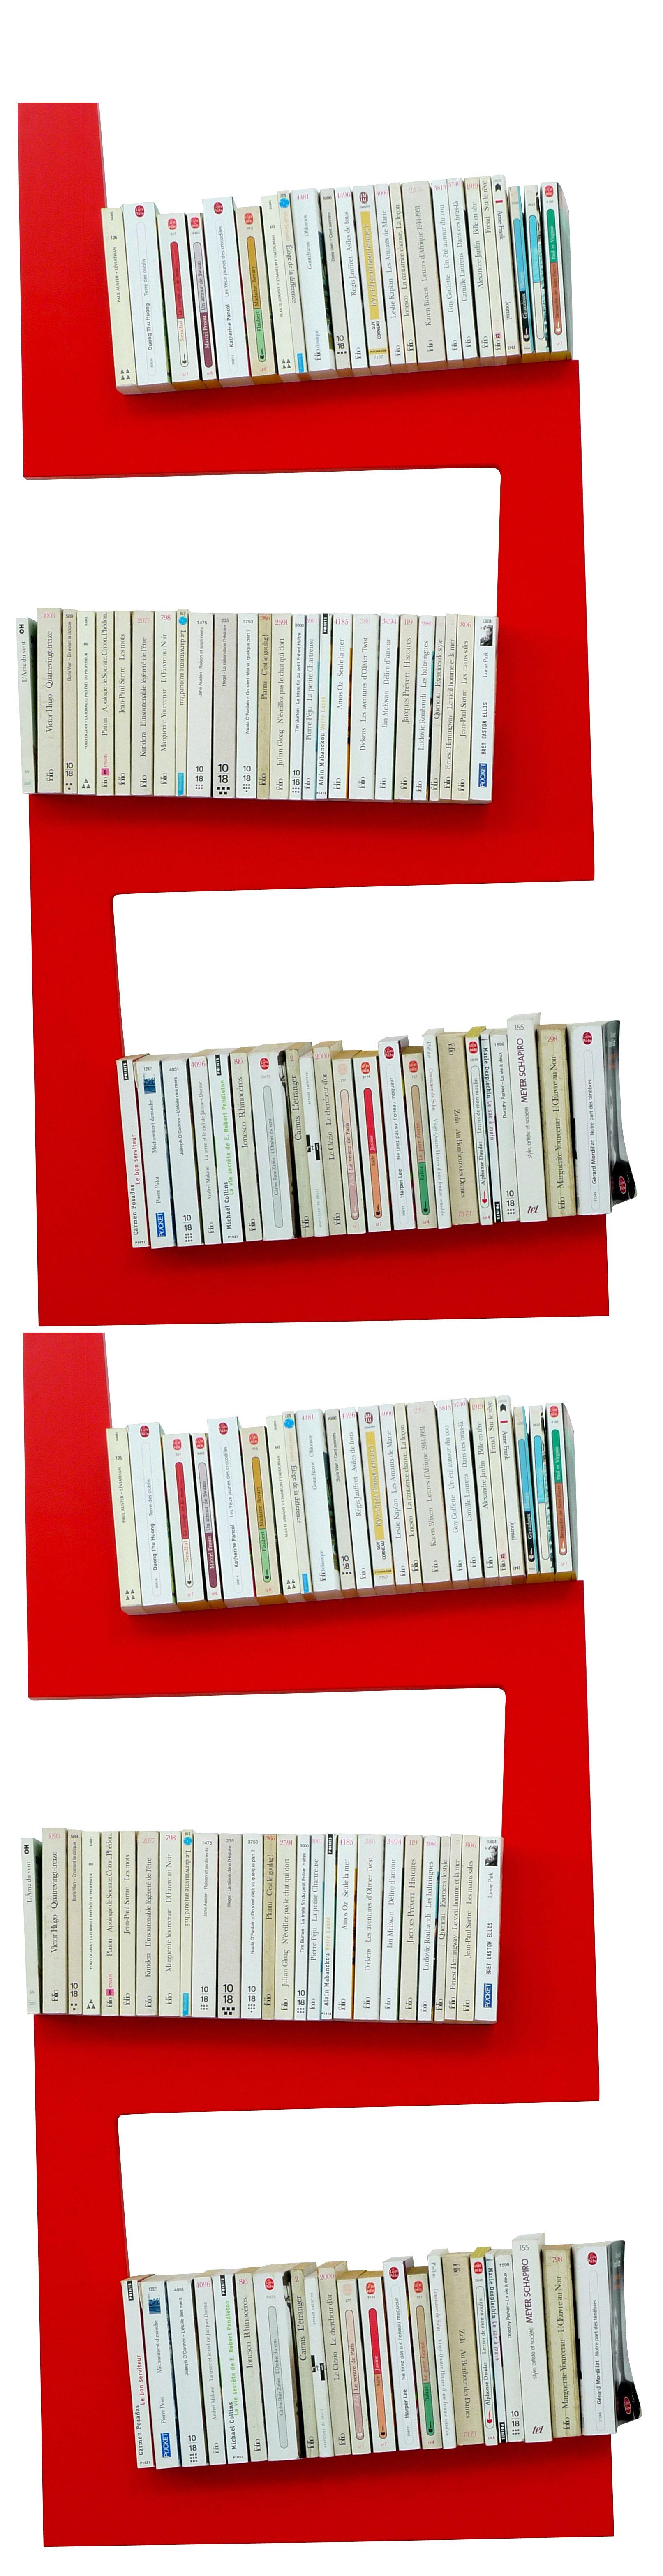 Möbel - Regale und Bücherregale - TwoSnakes Regal 2-er Set - La Corbeille - rot - lackierte Holzfaserplatte